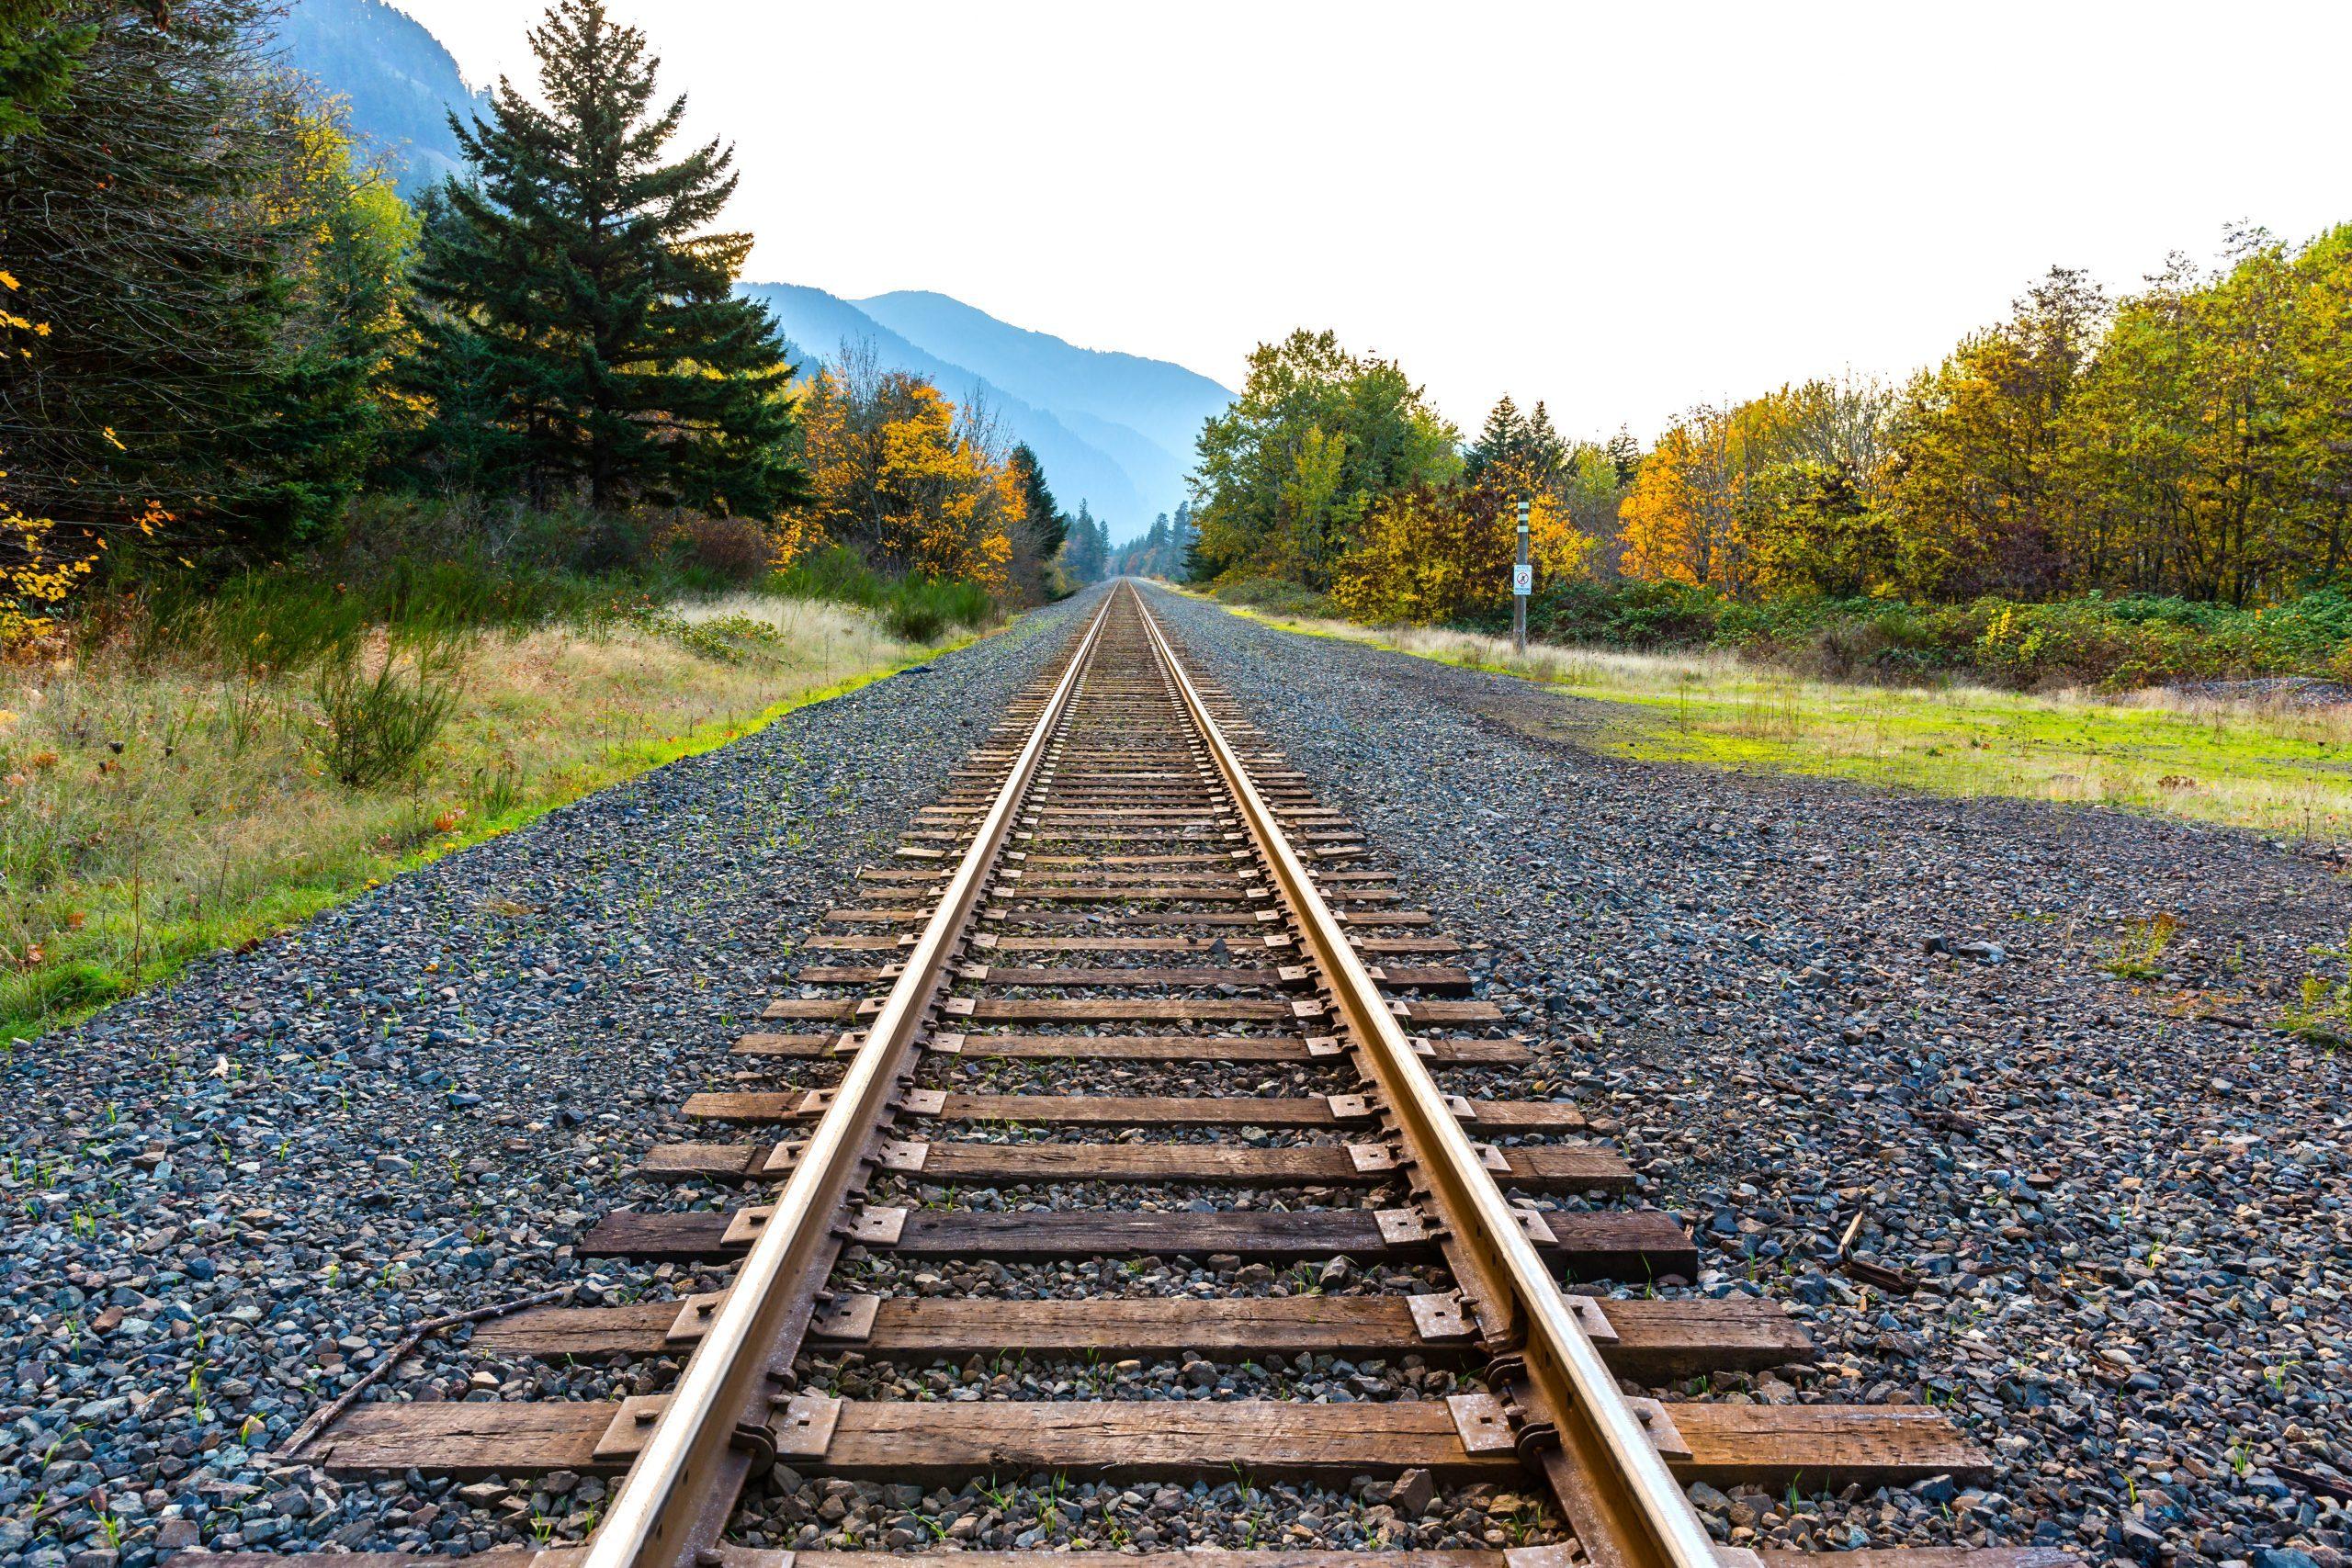 Straight Railroad Lines